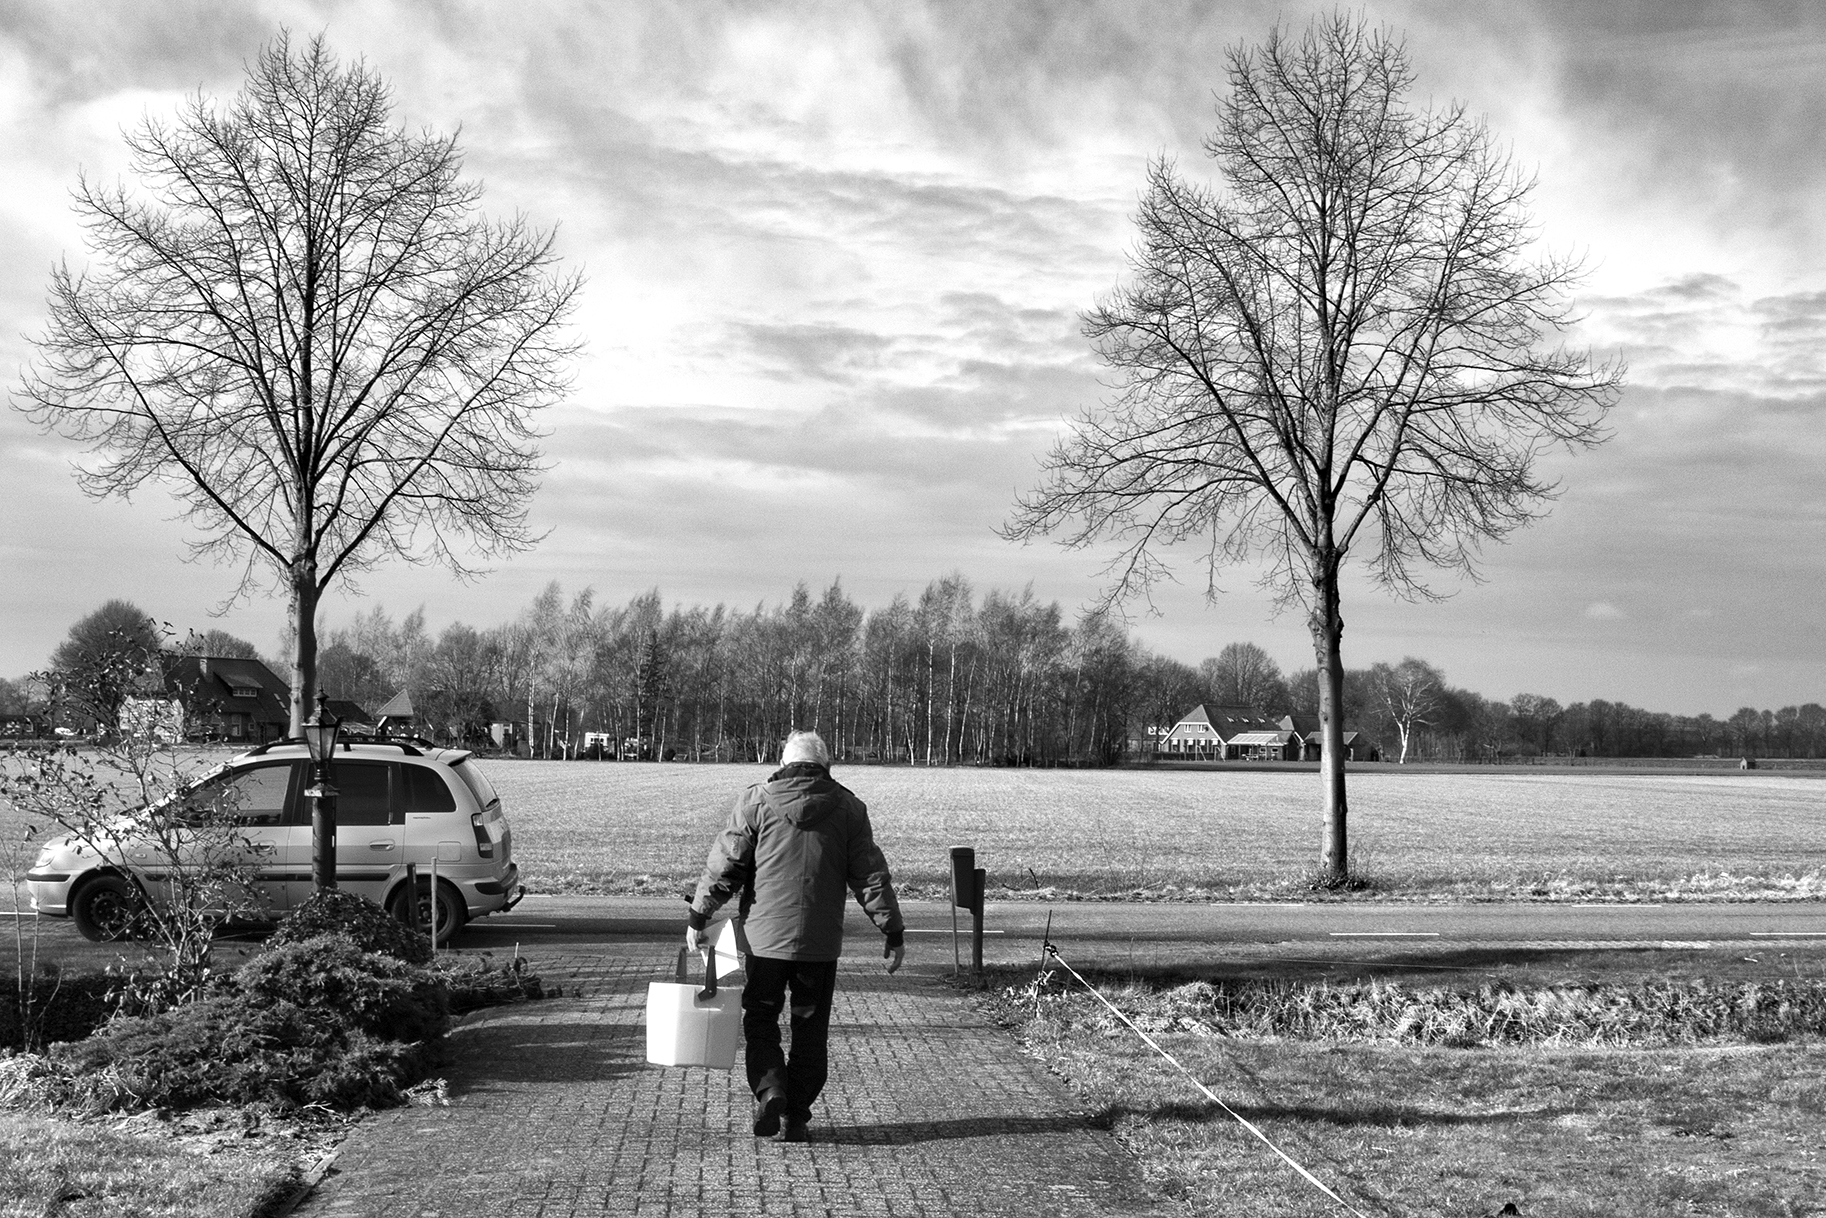 Silent Heroes Walking - Documentary Photographer